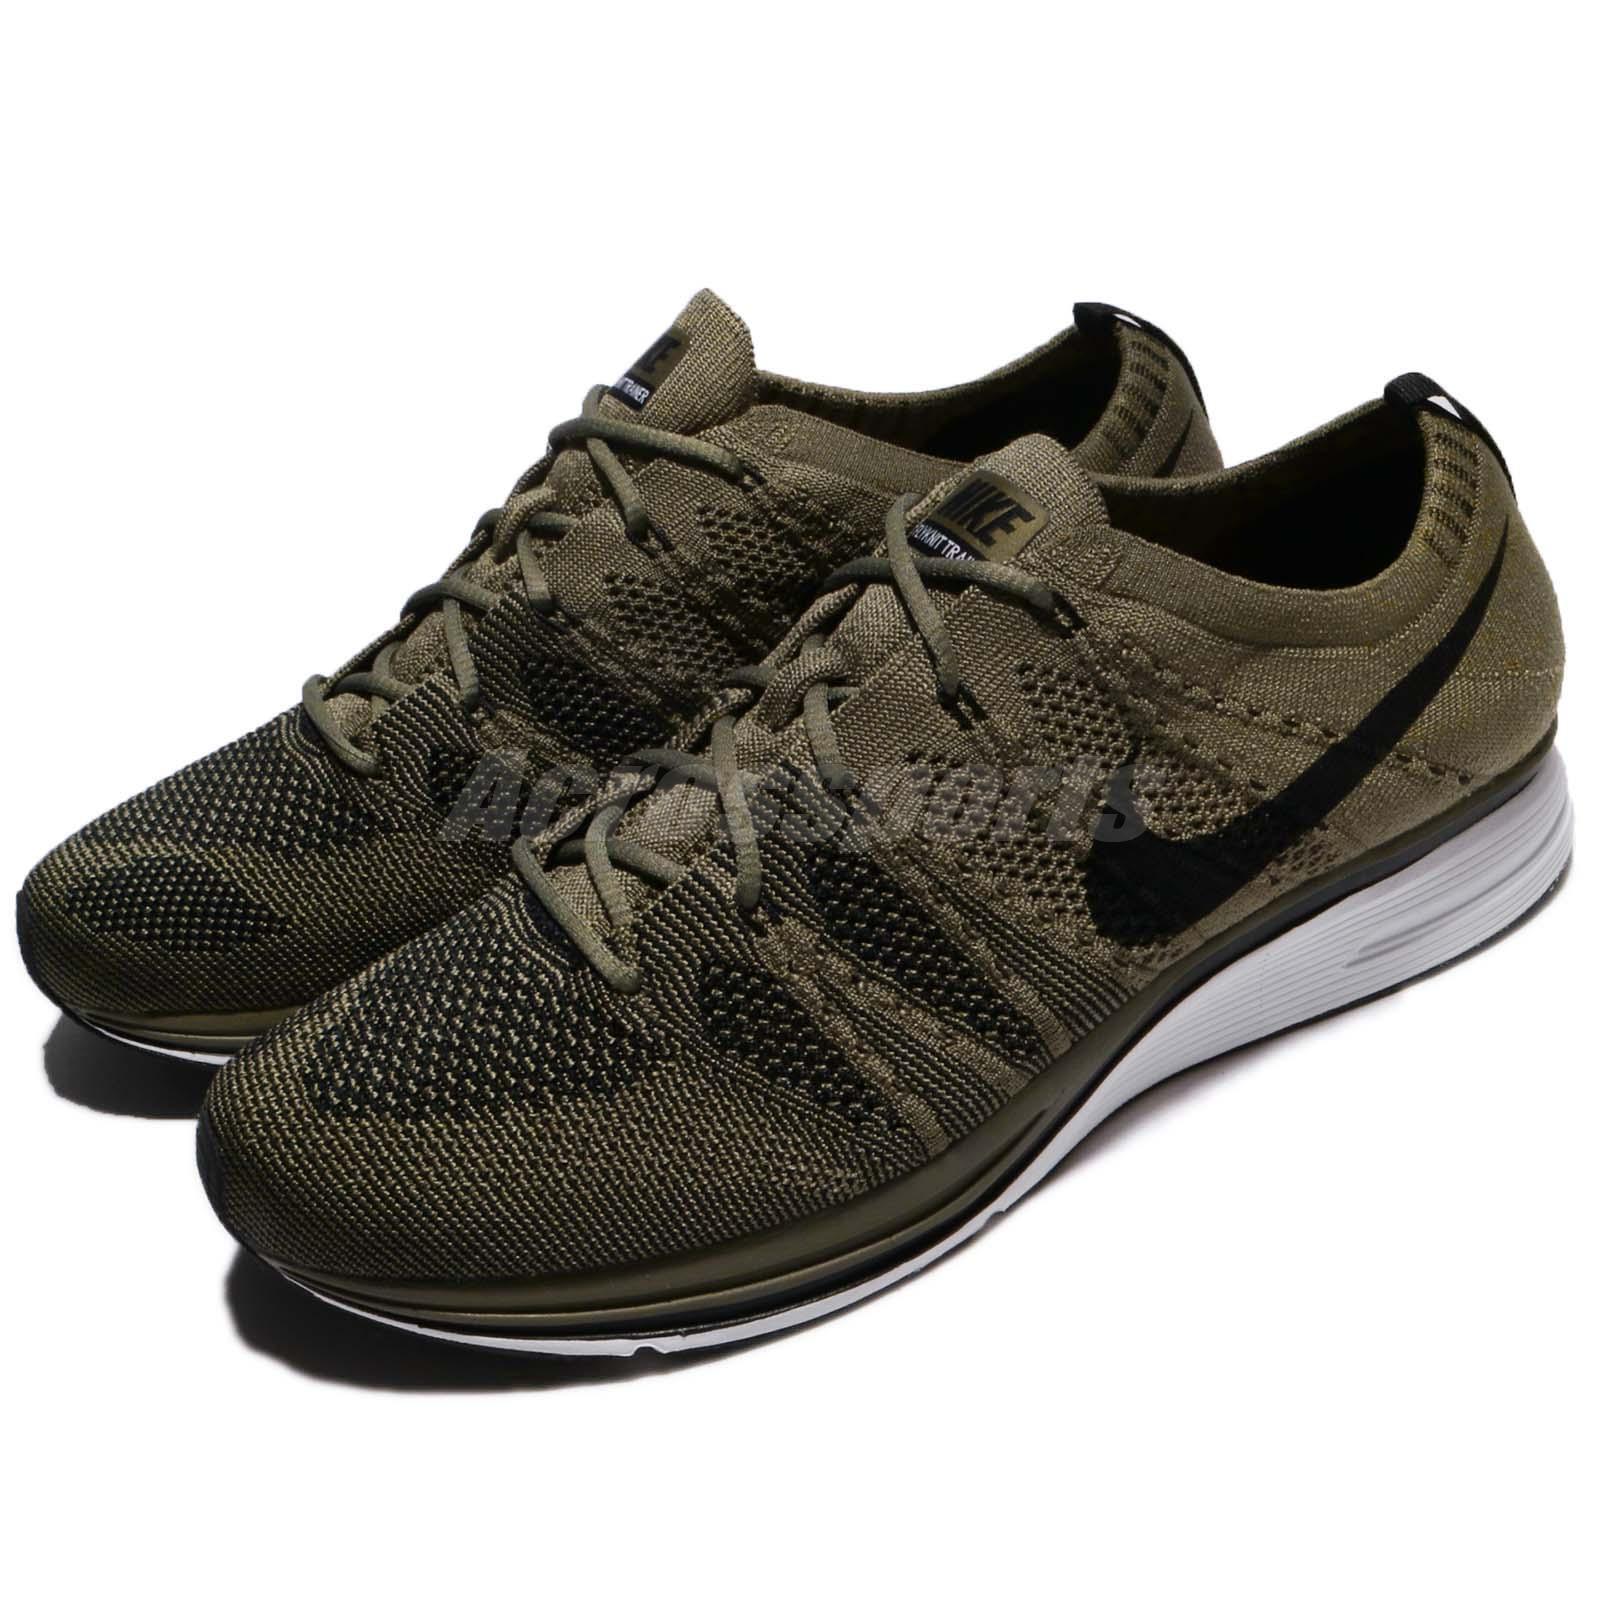 Nike Flyknit Trainer Medium Olive Green Black Men Running shoes AH8396-200